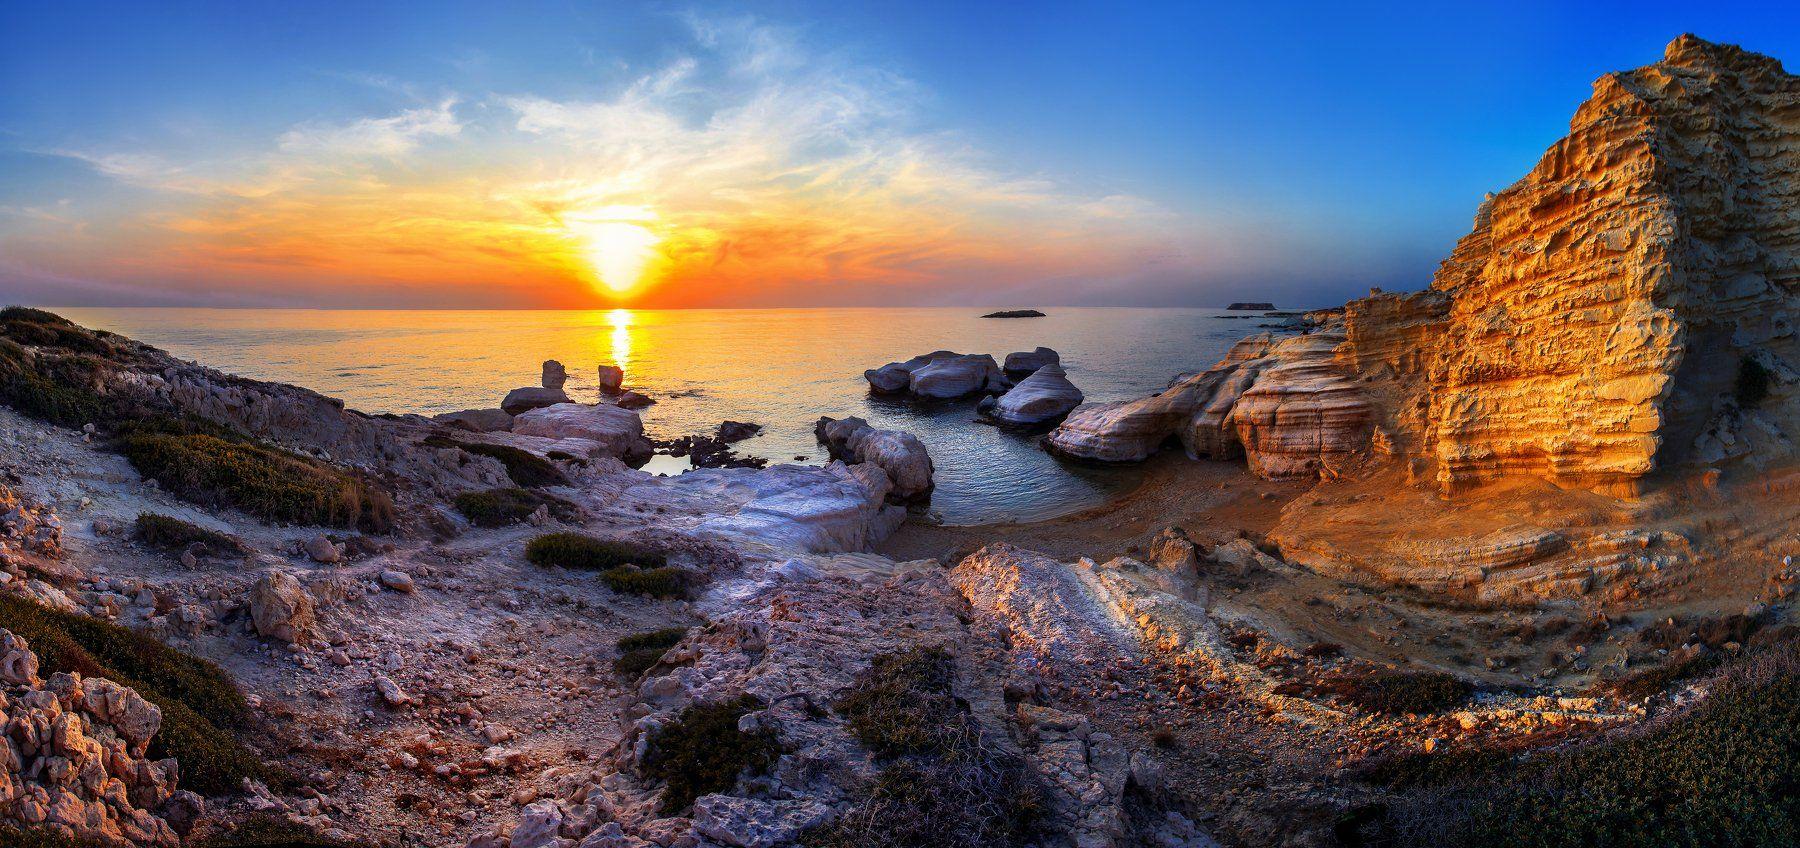 Cyprus, Sea, Sunset, Orange, Evening, Вячеслав Ложкин